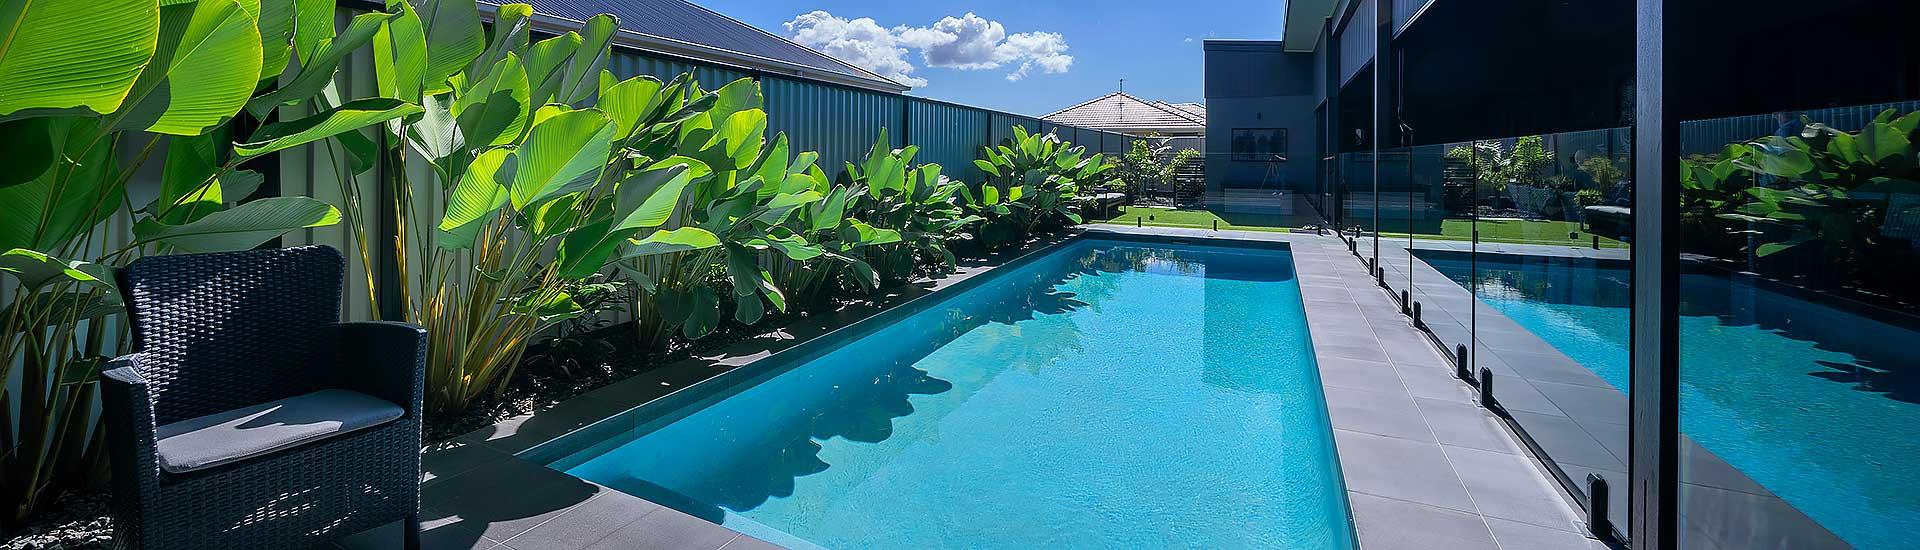 concrete swimming pool builder